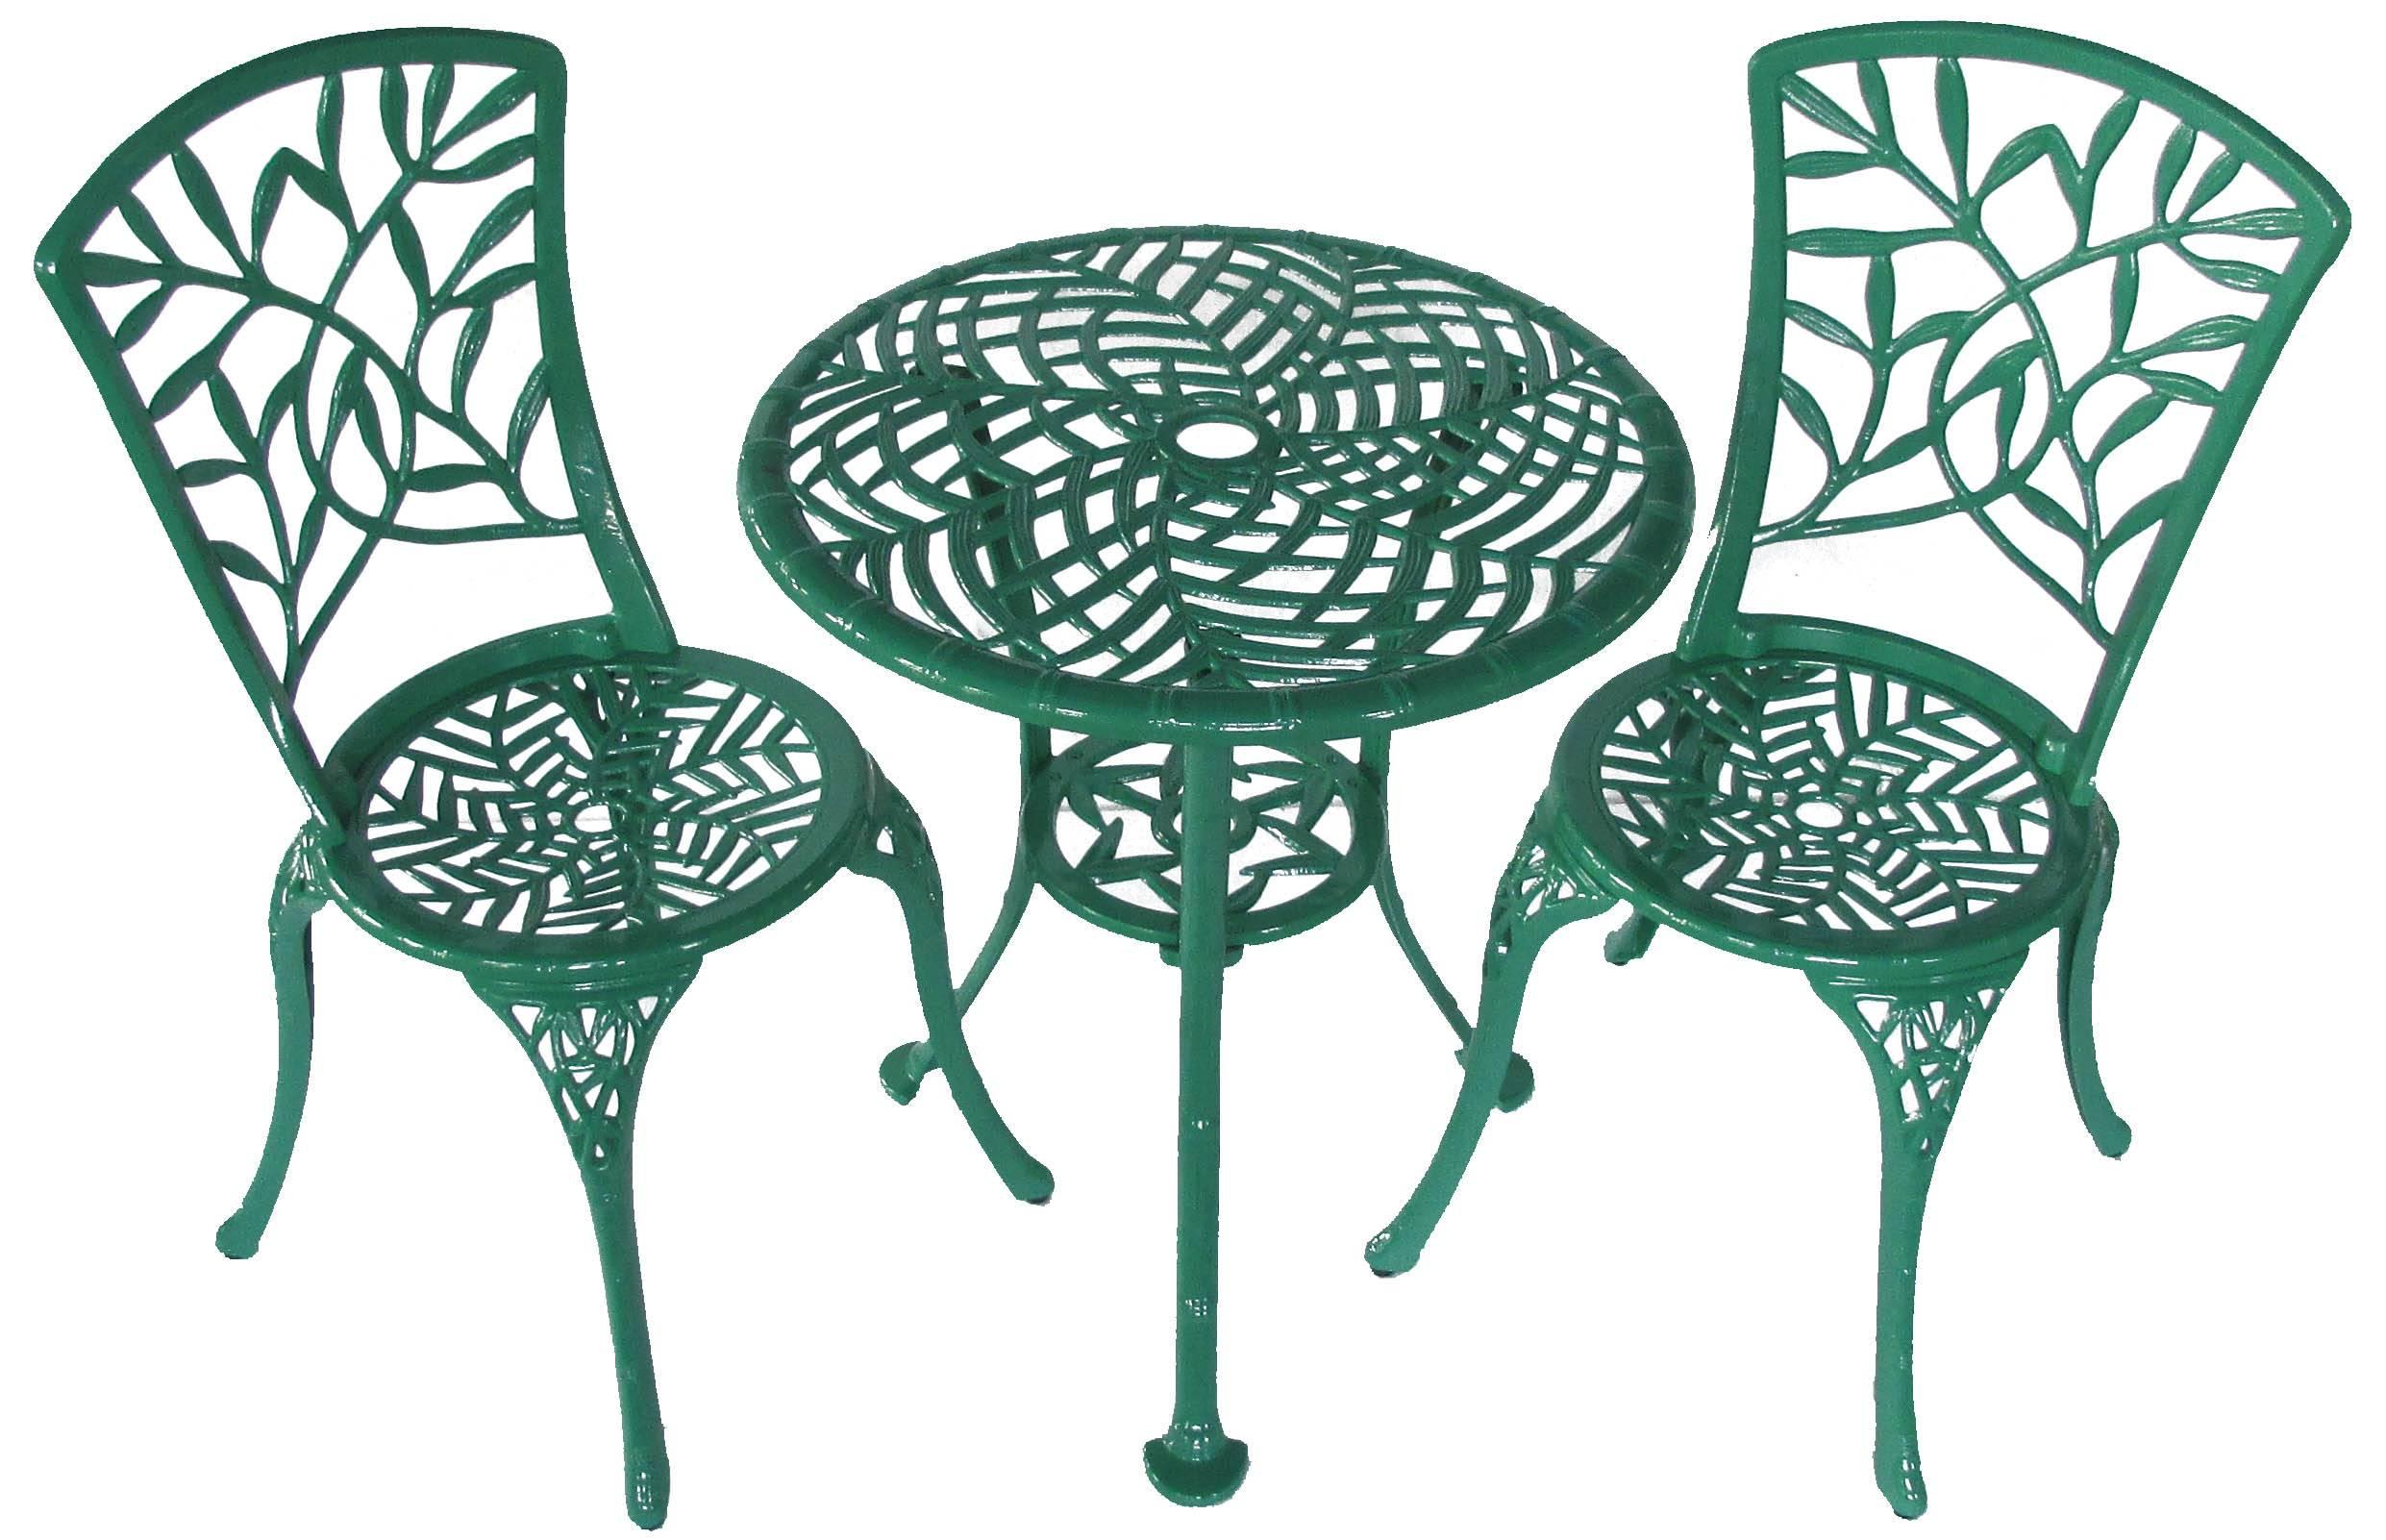 3-piece lowes wicker patio furniture/cast aluminum bistro set